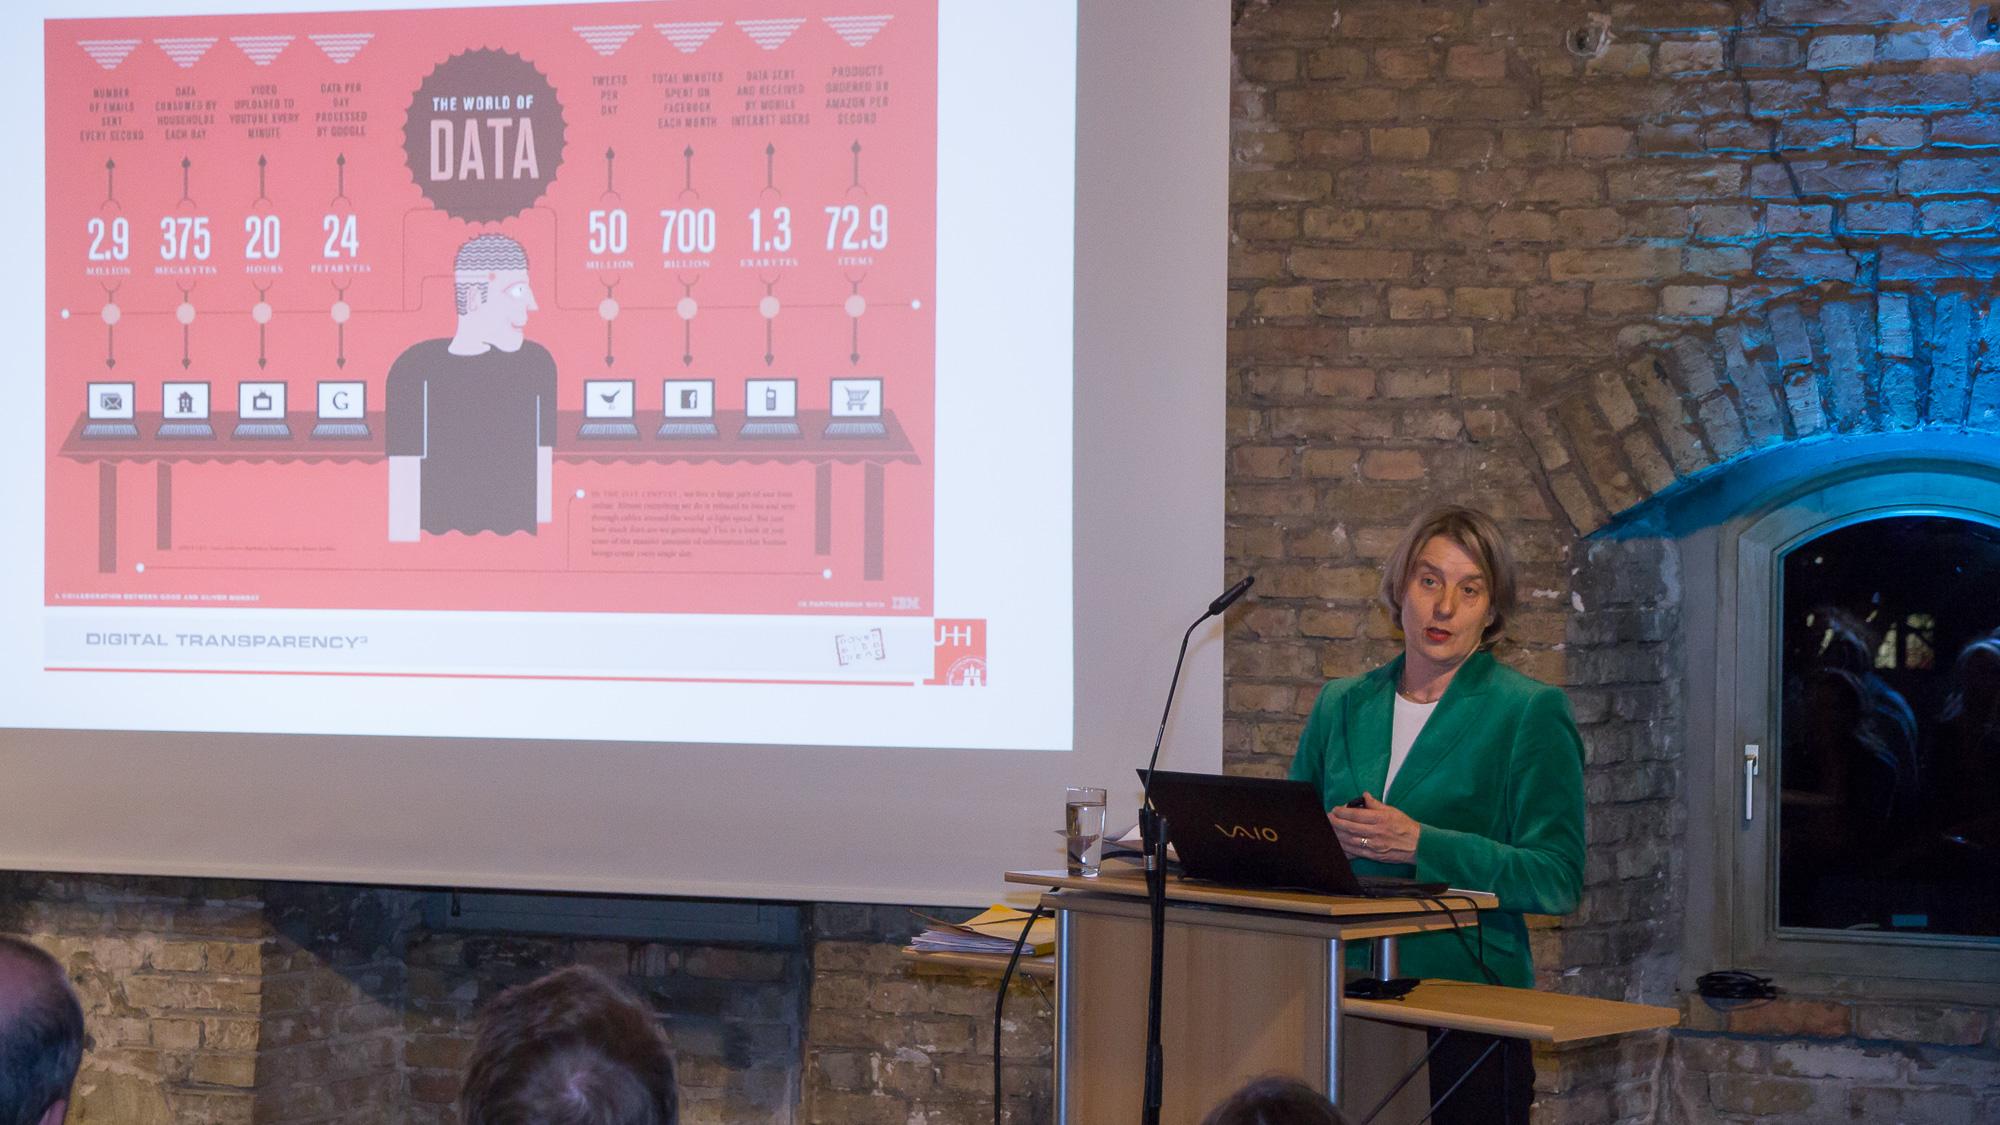 Ingrid Schneider at big data: big power shifts?